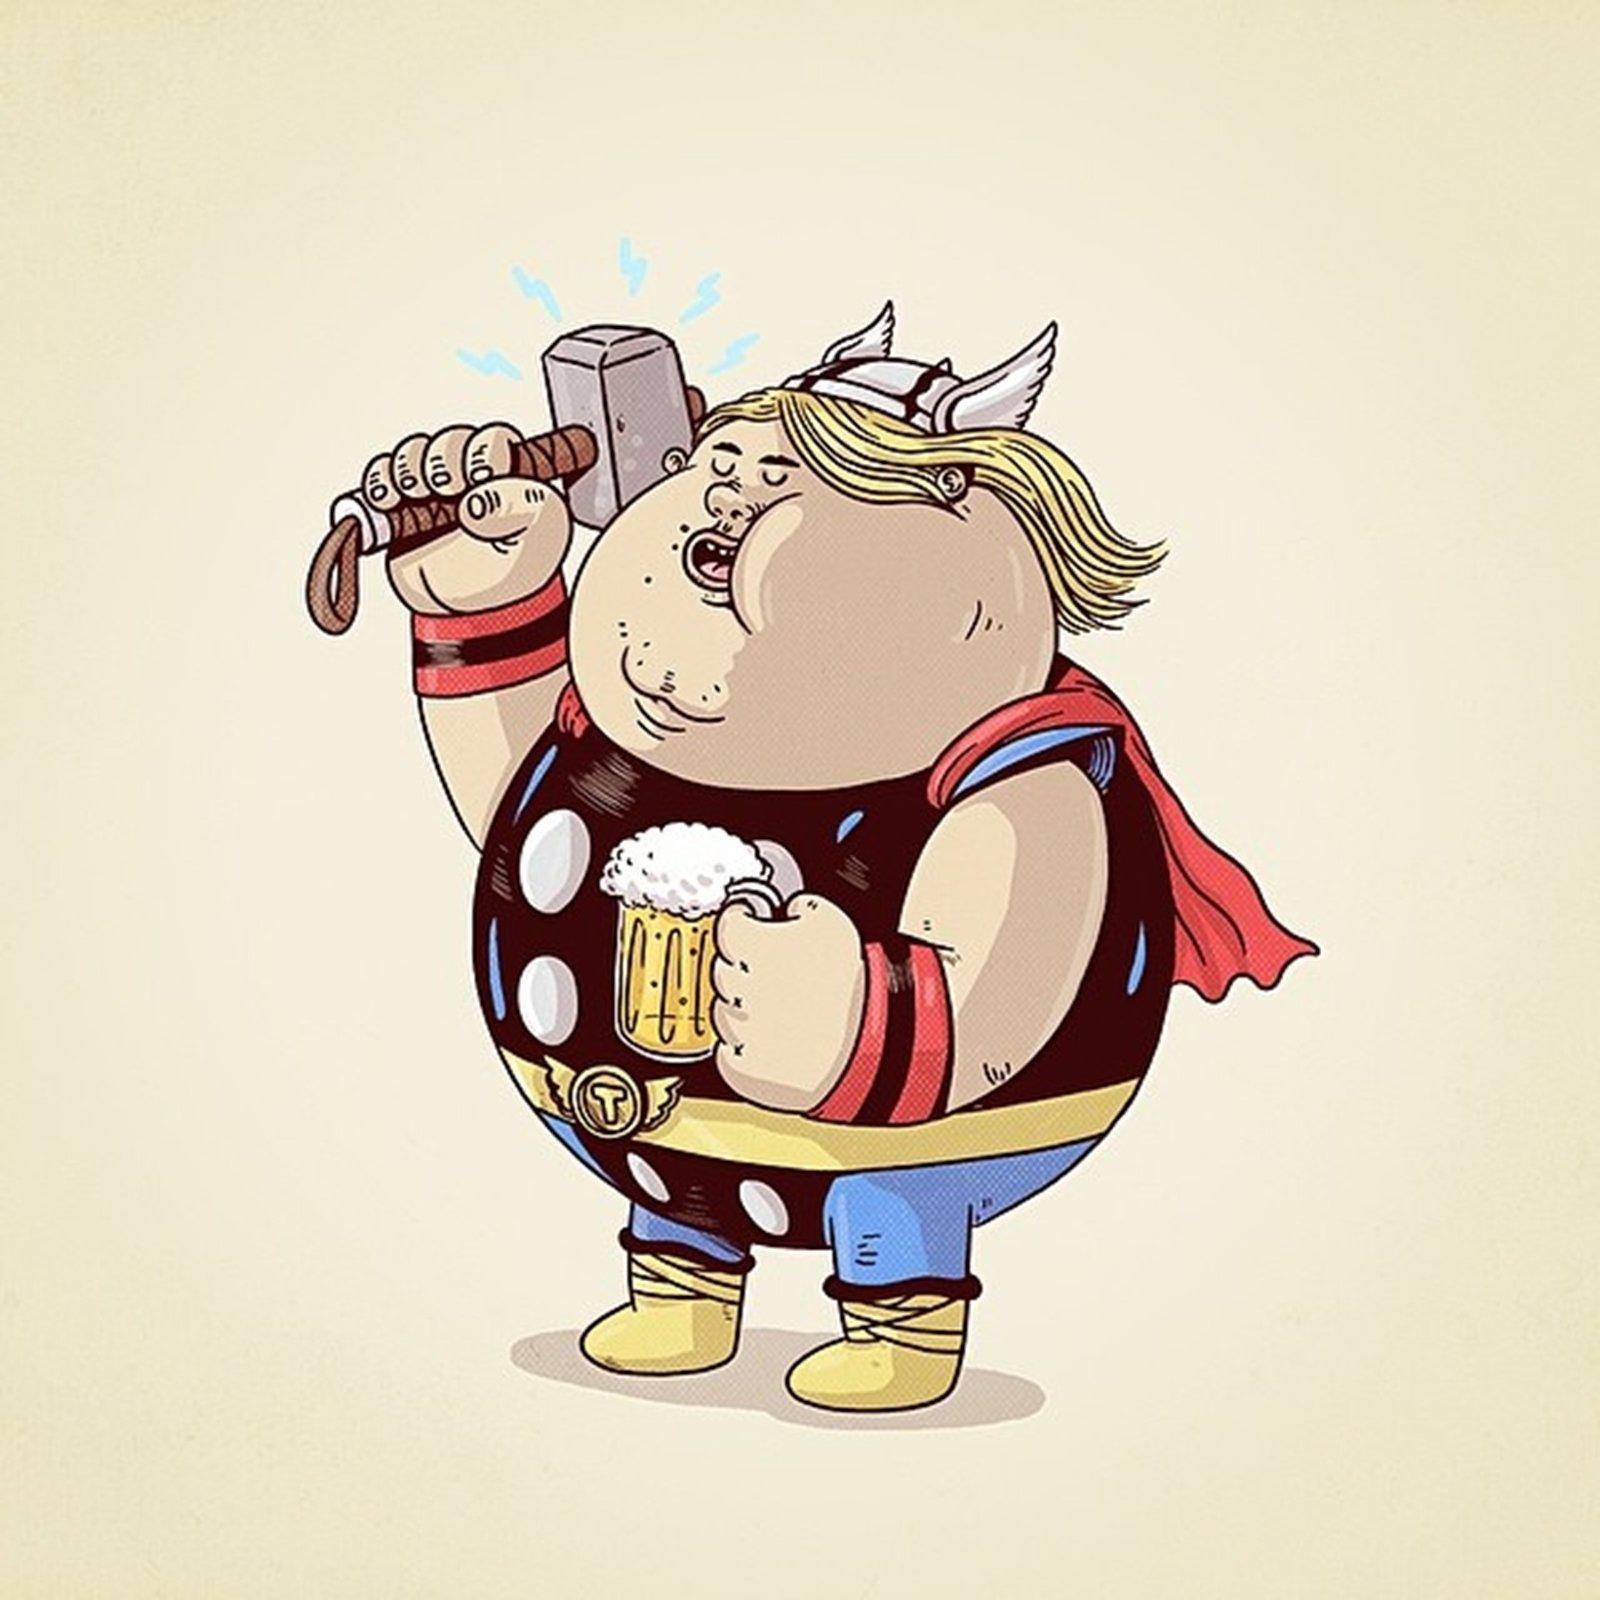 Thor Cartoon Wallpaper Thor Fat Marvel Comics Cartoon